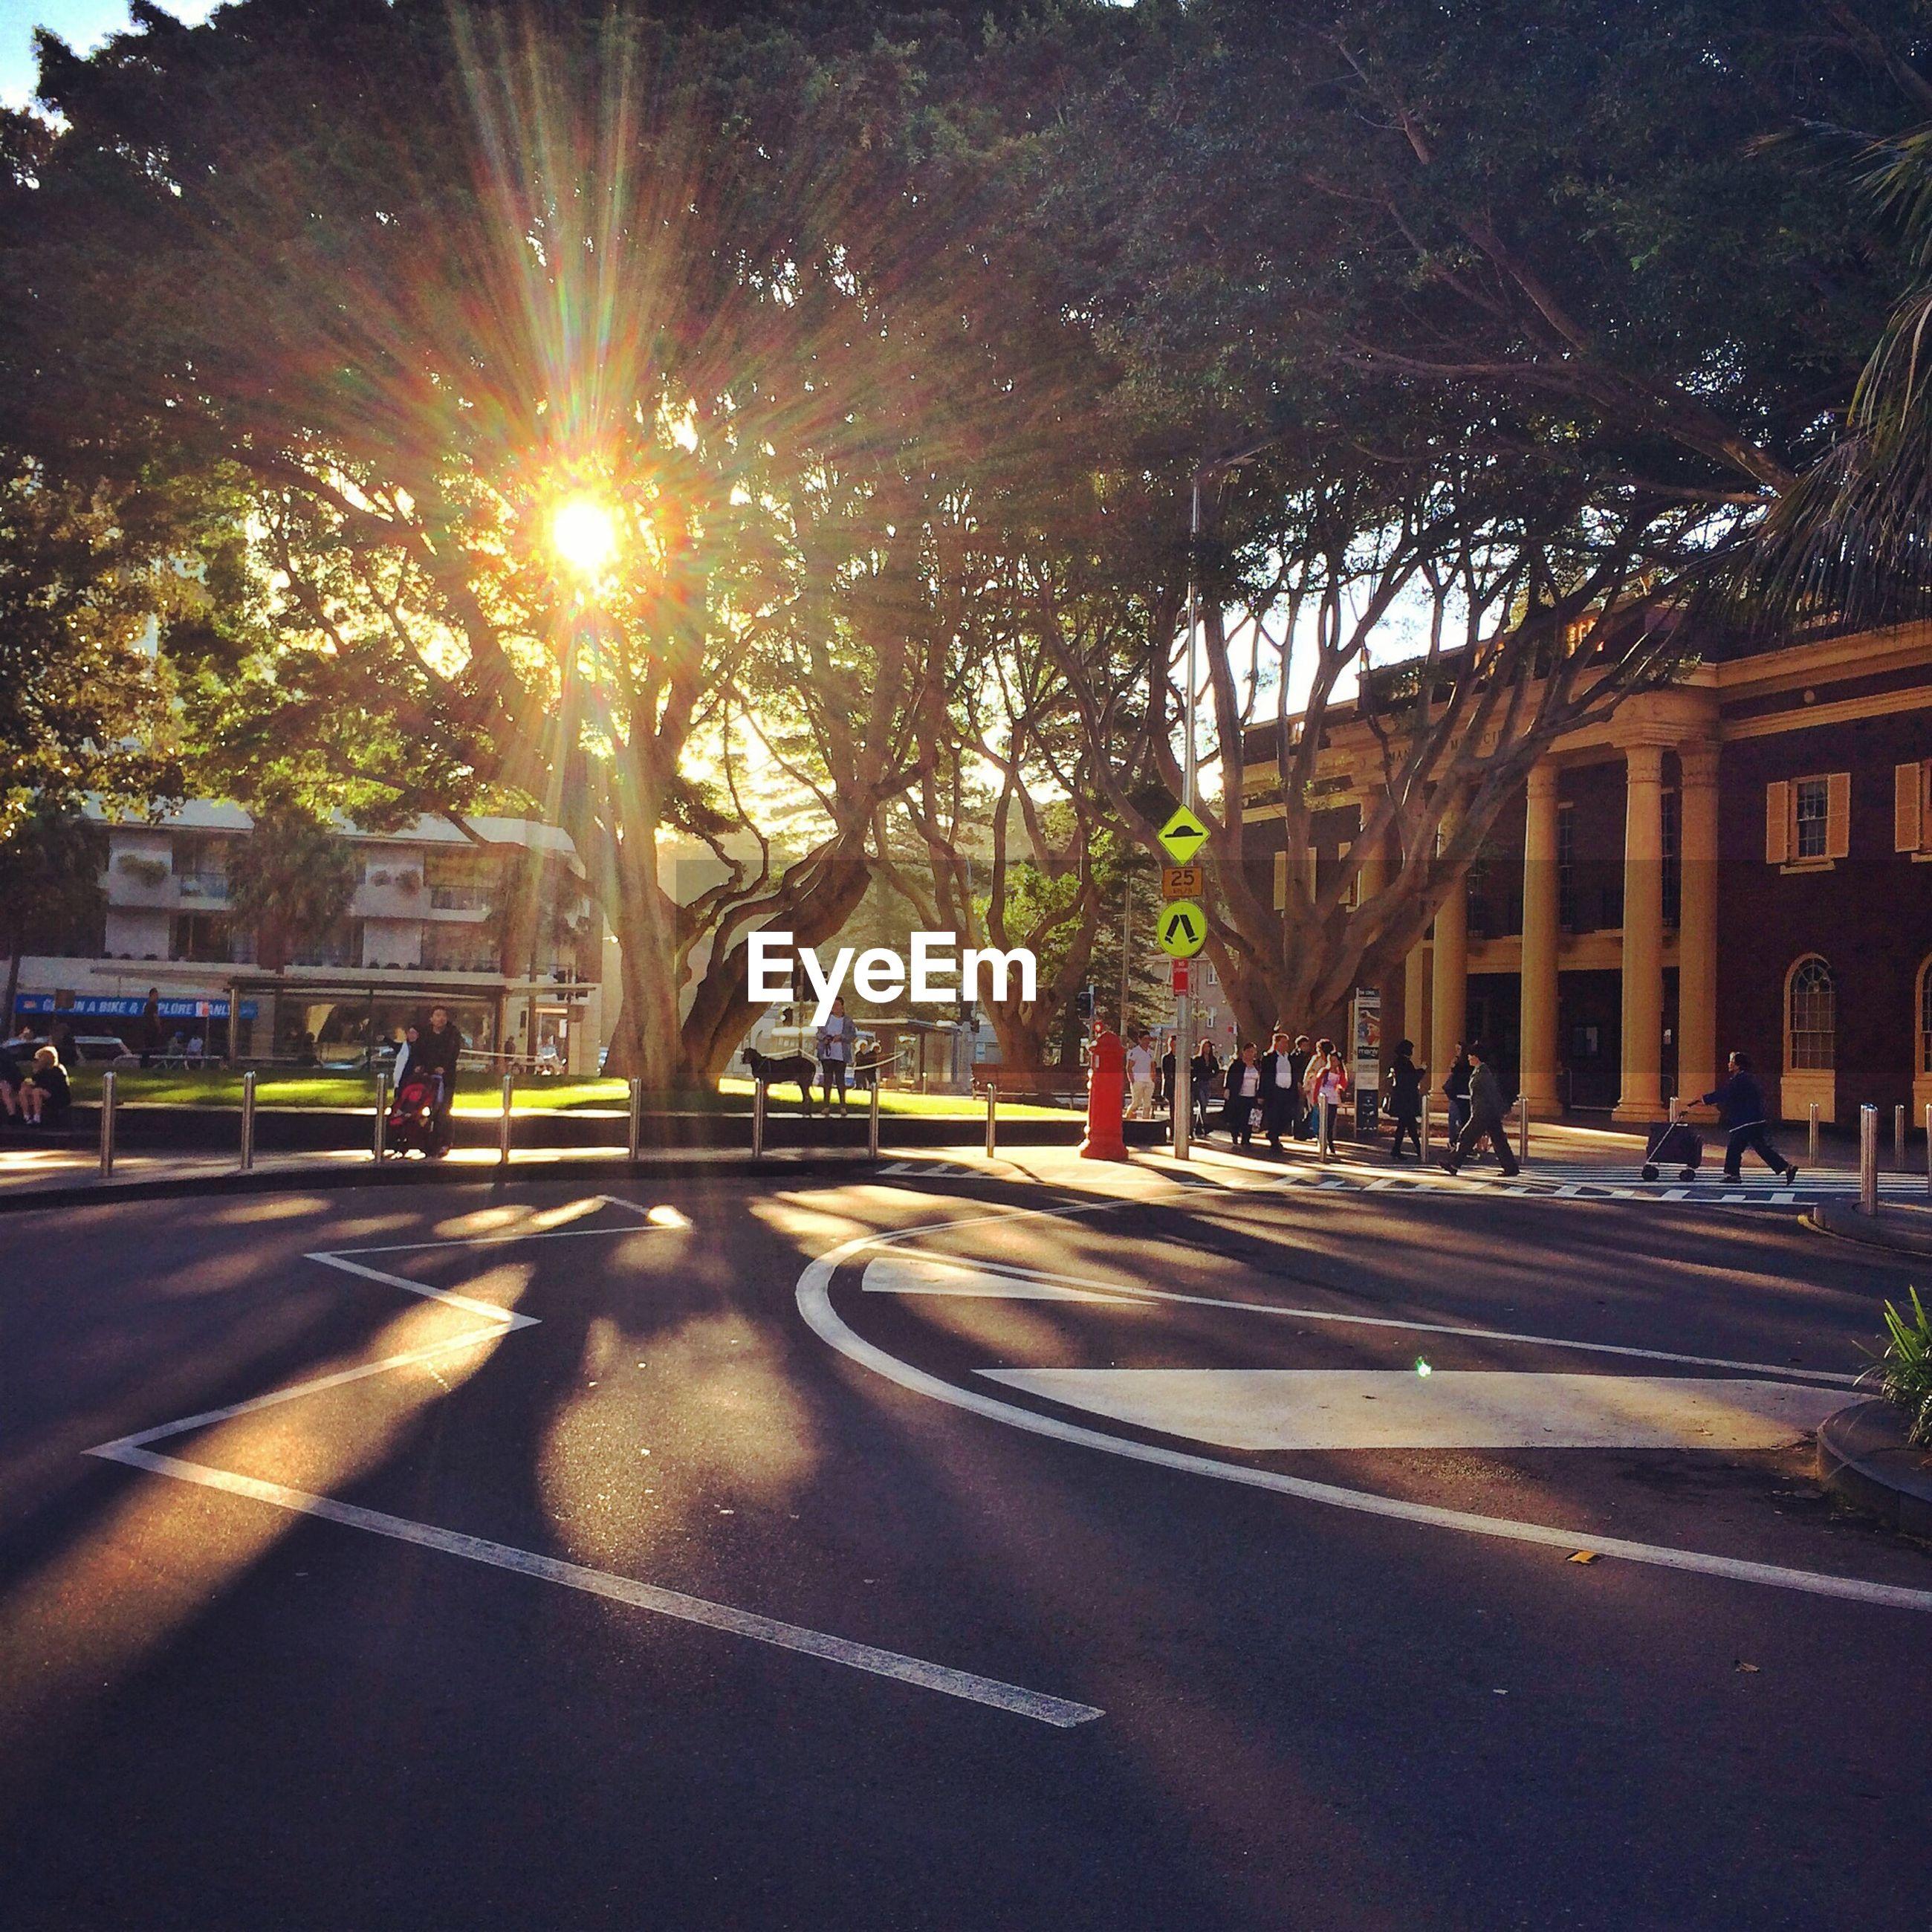 Sun shining through trees by street